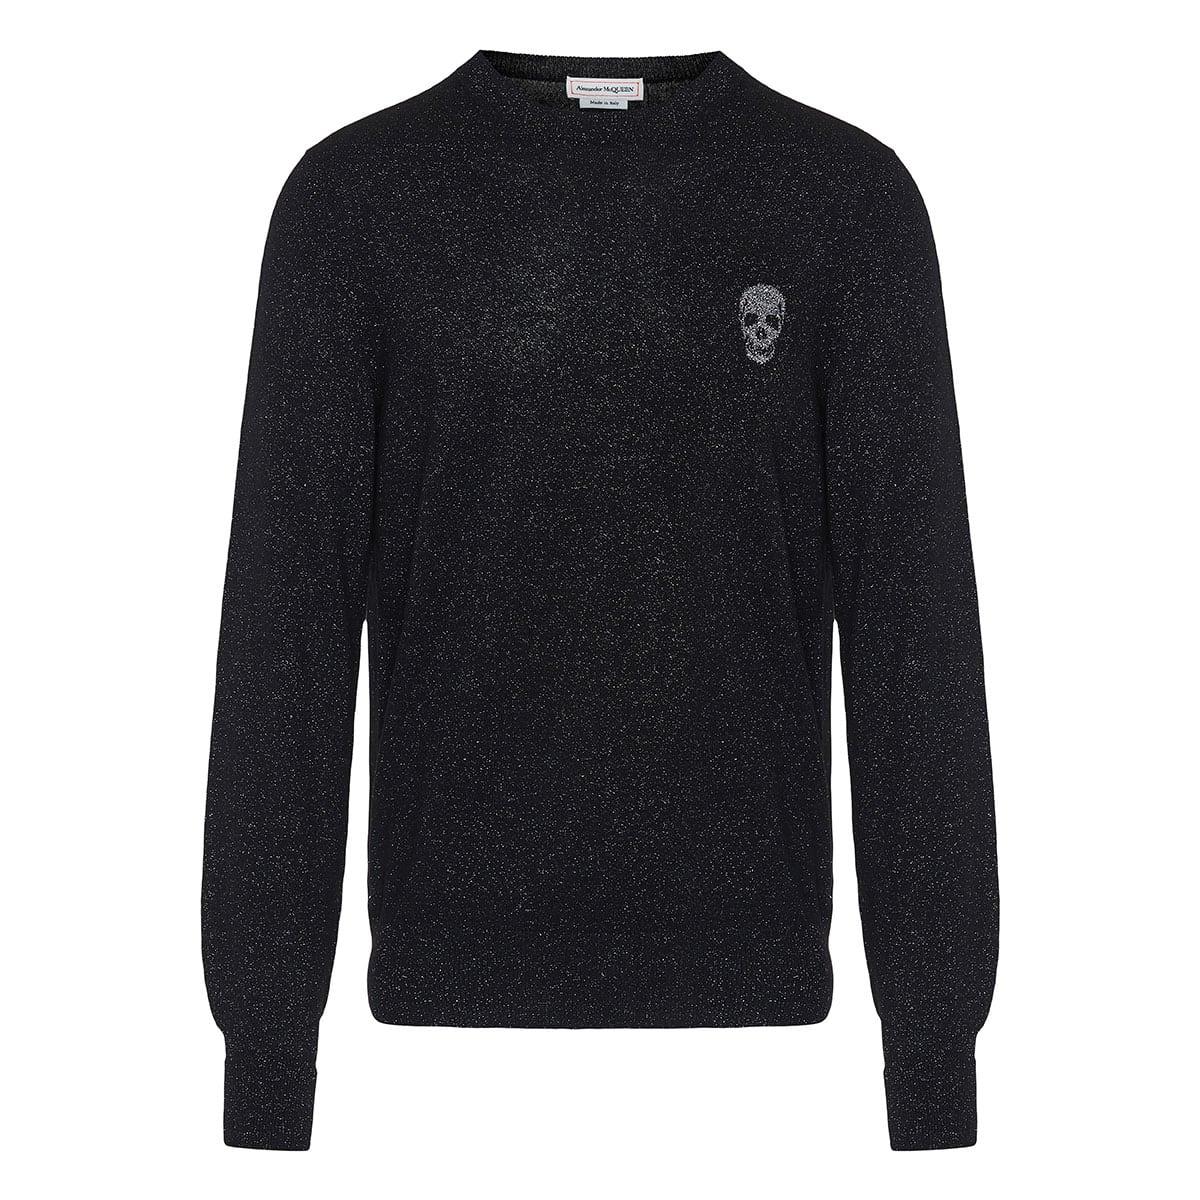 Skull lurex sweater